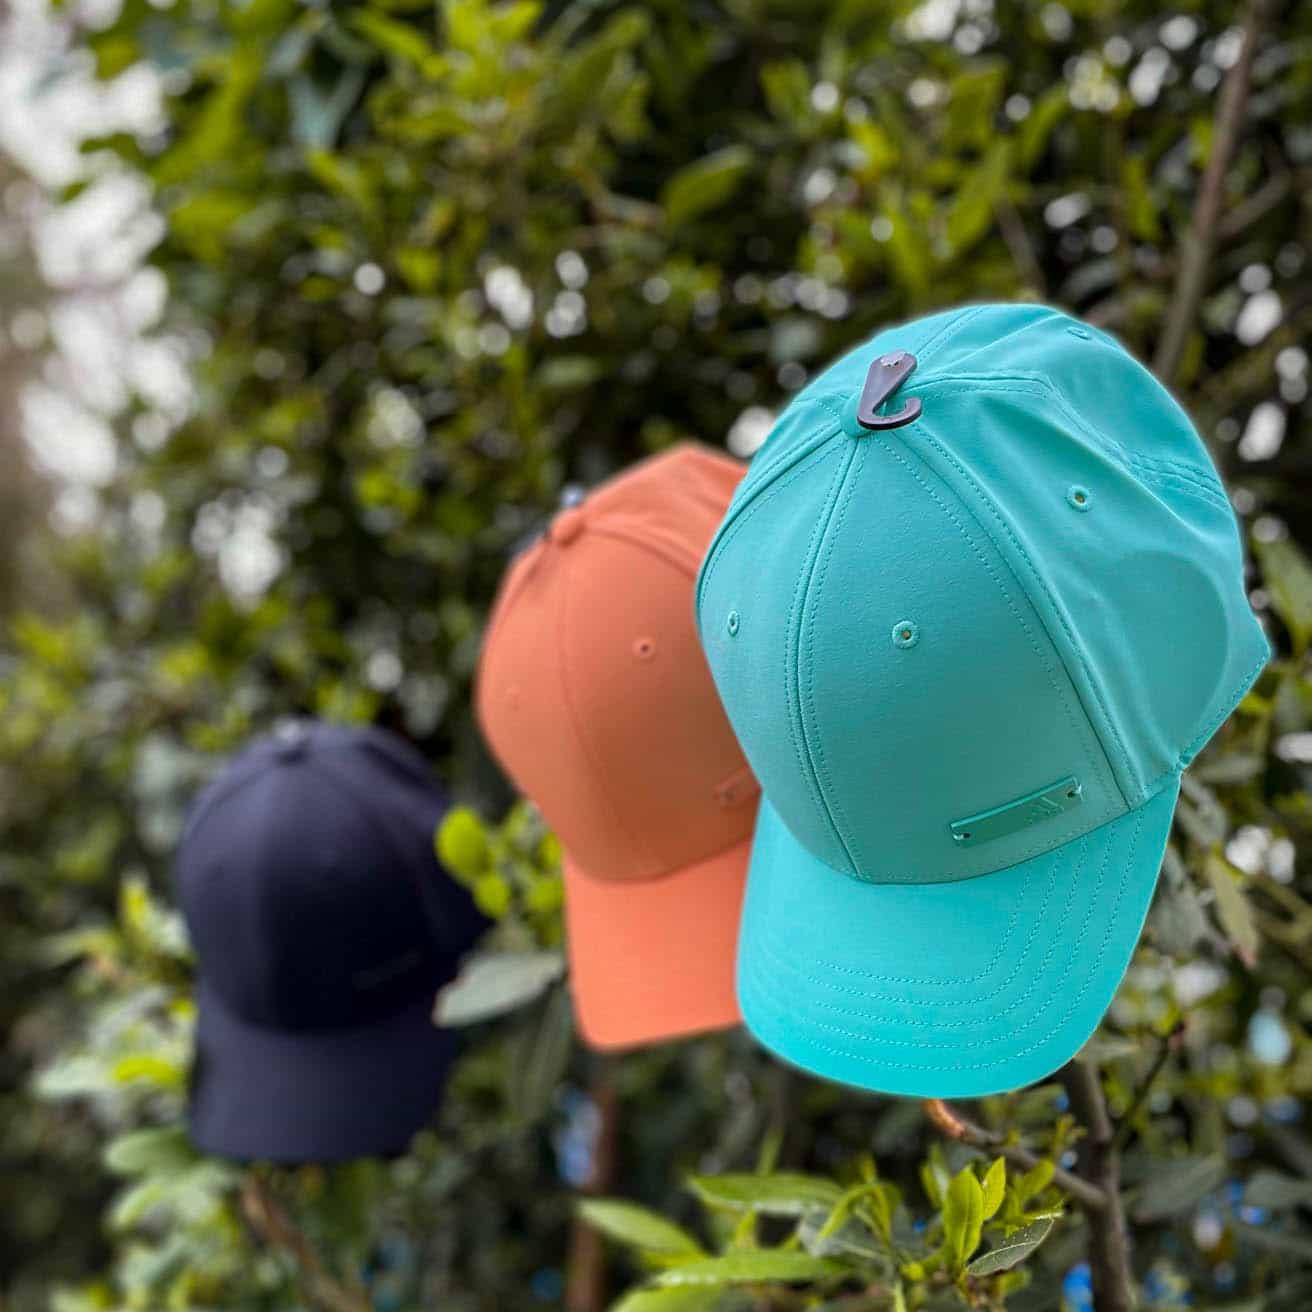 gorras adidas metalbadge tres colores